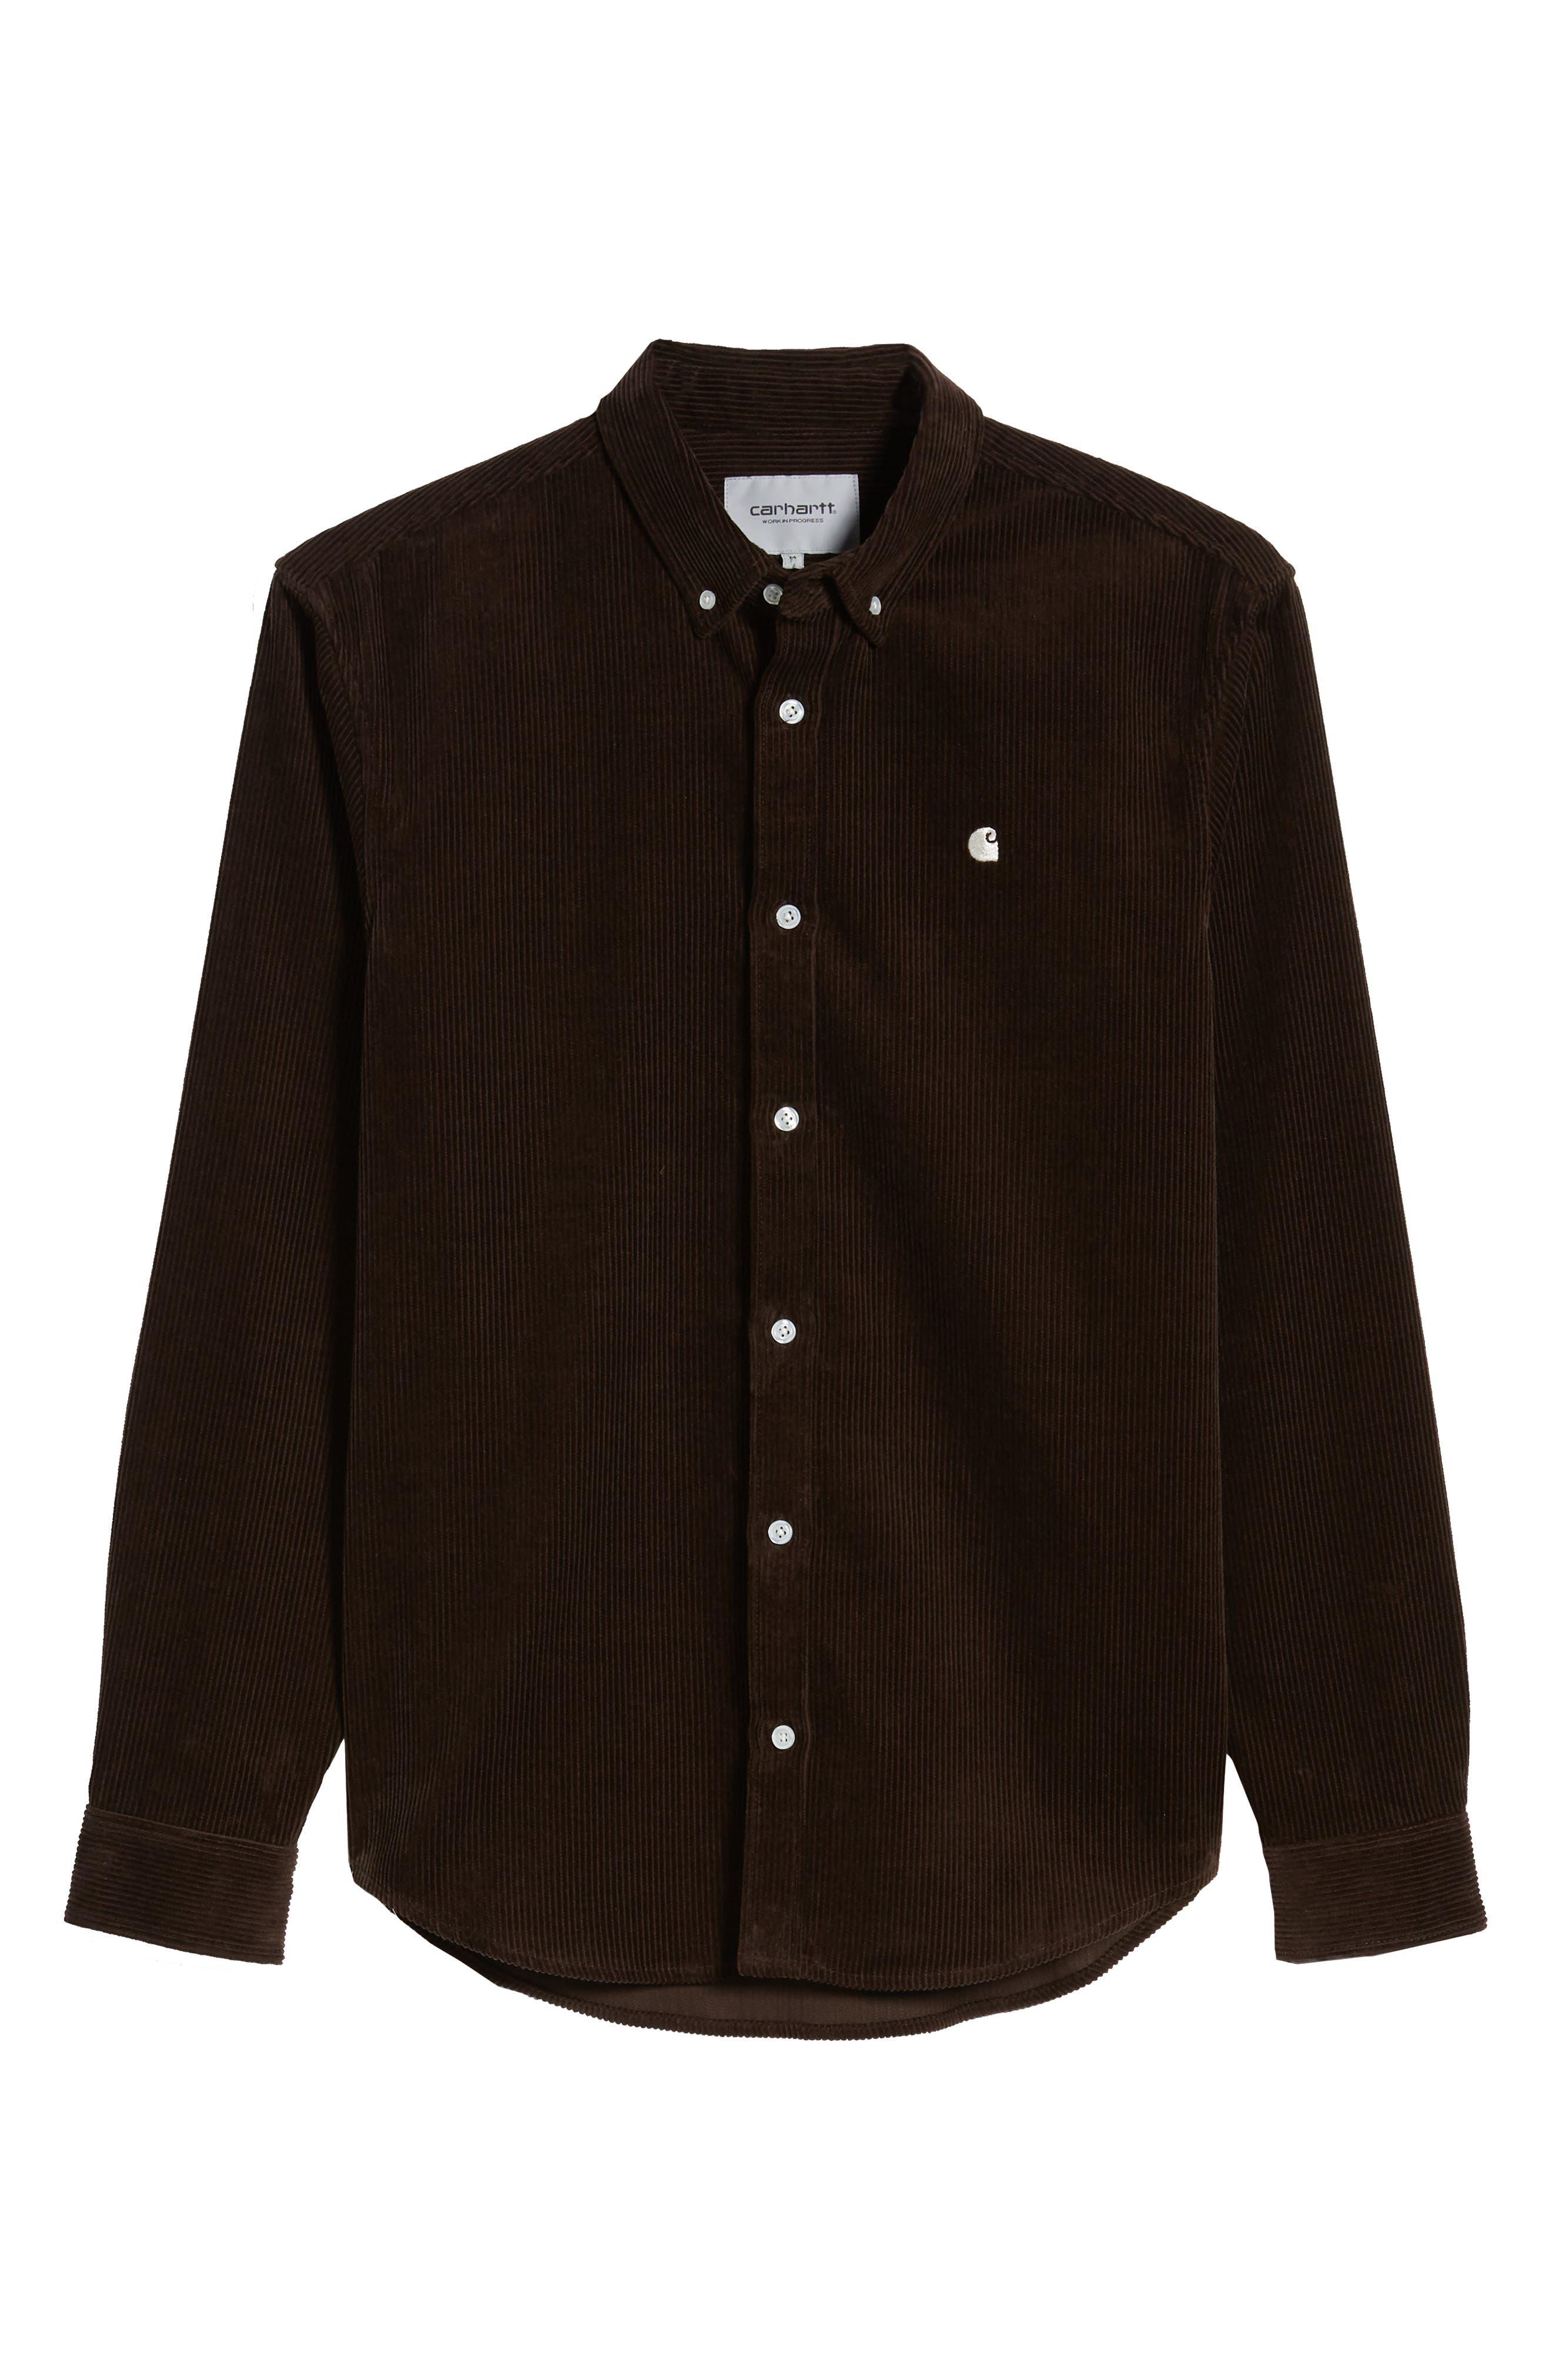 Madison Corduroy Shirt,                             Alternate thumbnail 5, color,                             TOBACCO / WAX